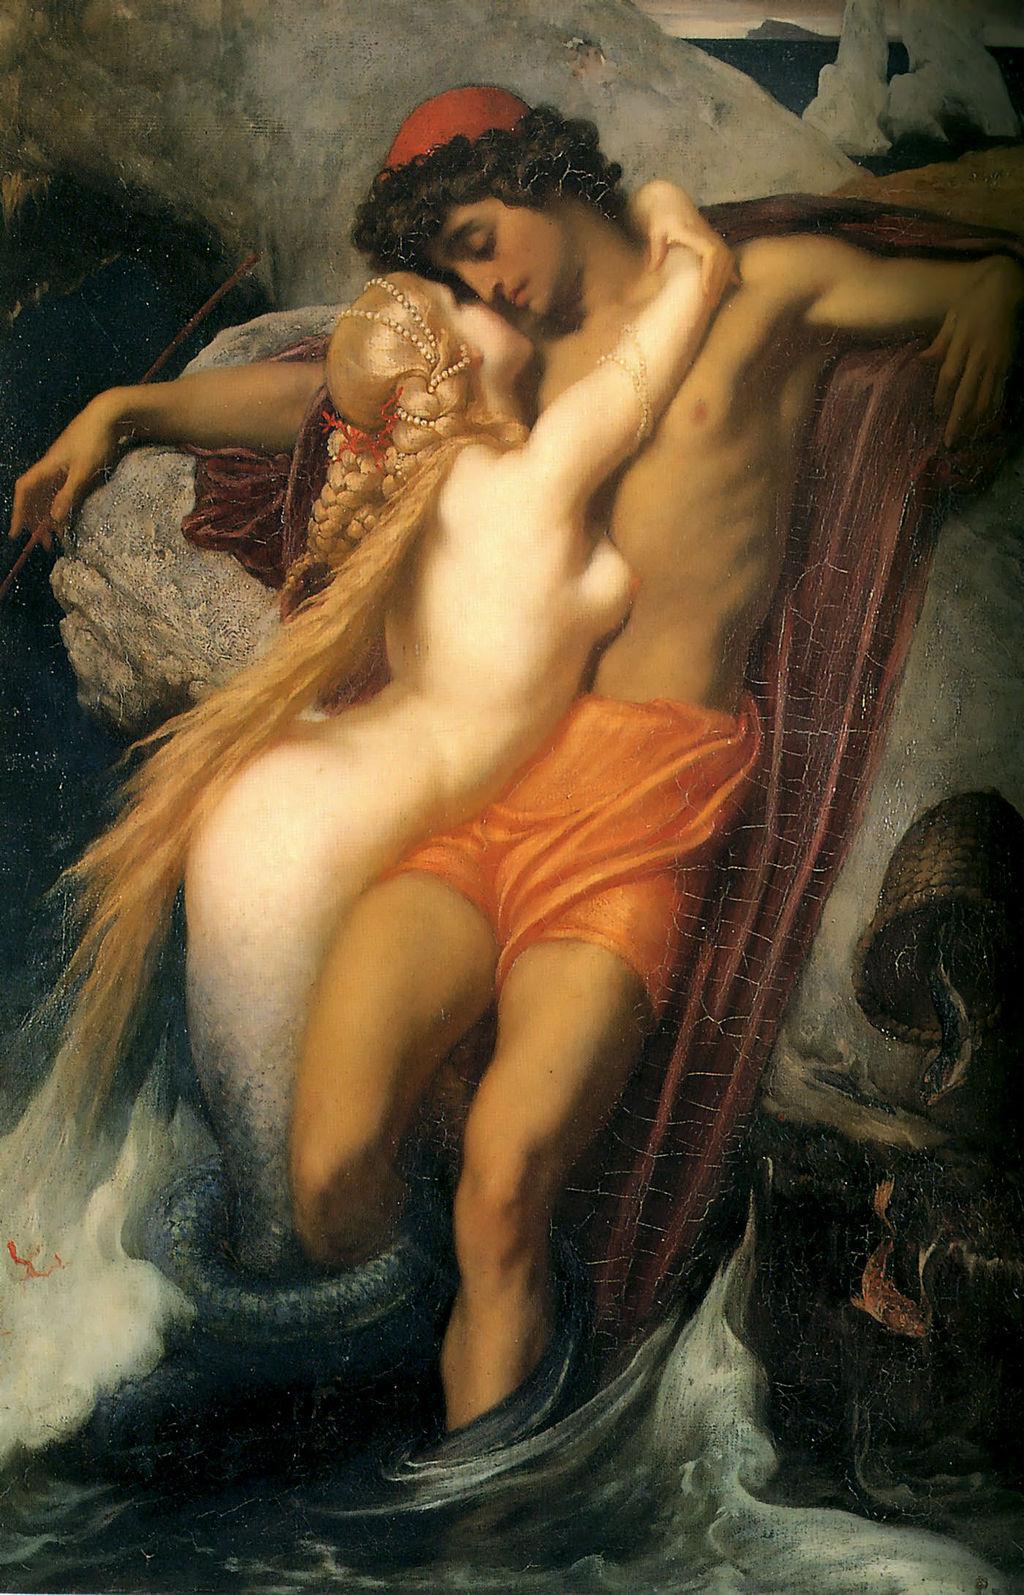 Domain of erotica